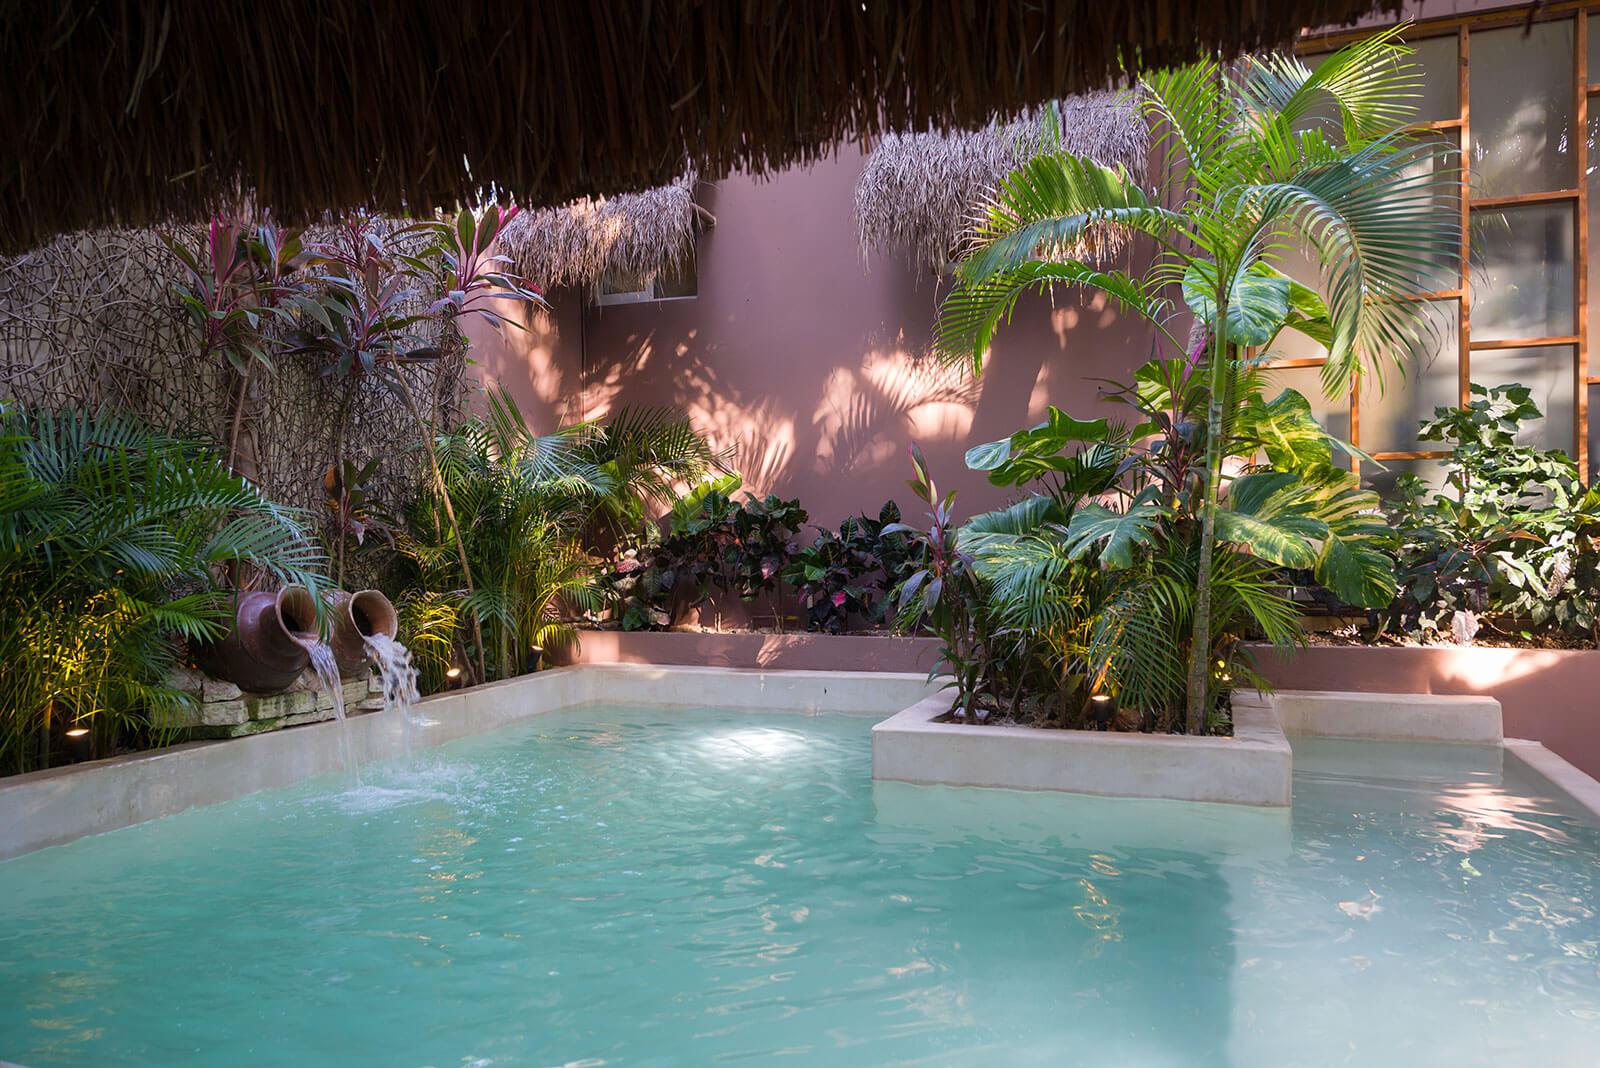 Maya_Luxe_Riviera_Maya_Luxury_Vacations_Villa_Rentals_Tulum_Playa_del_Carmen_Mexico_Bejuco_House_14.jpg